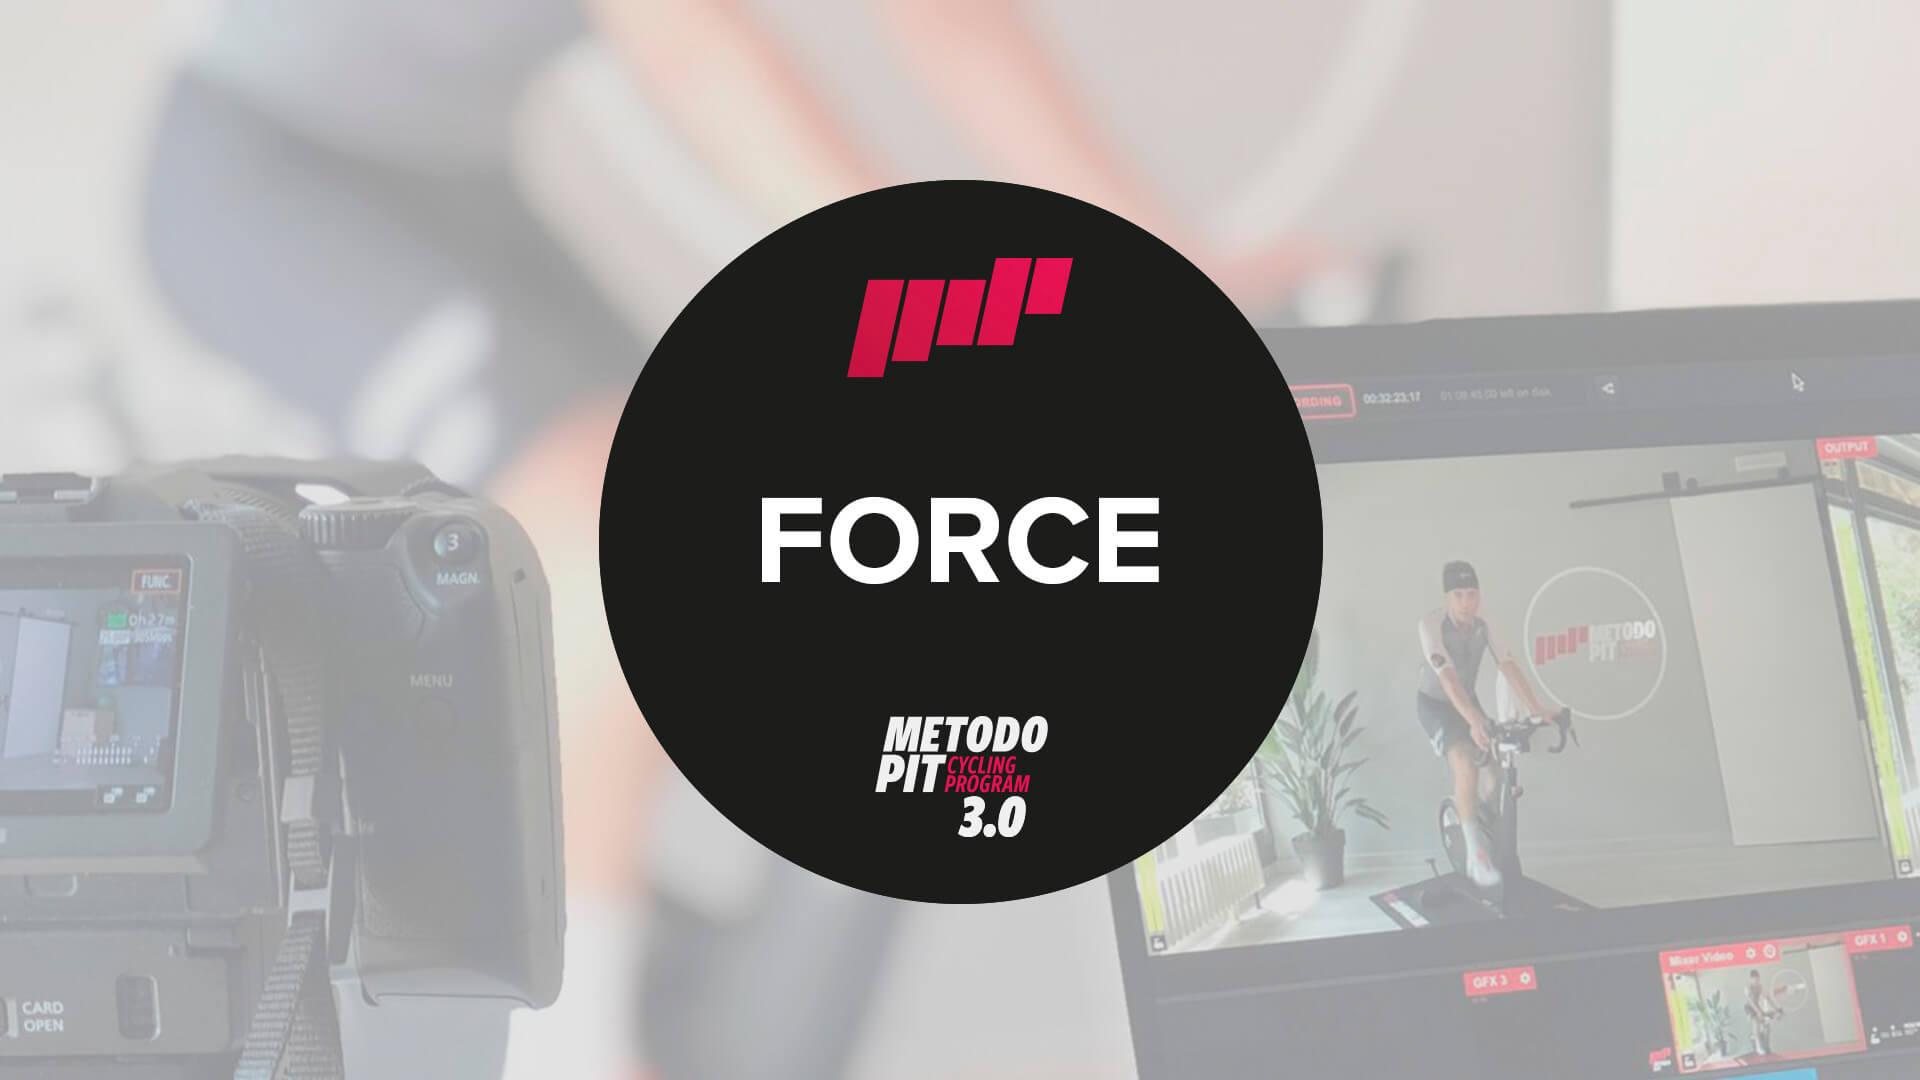 Metodo Pit 3.0 Force